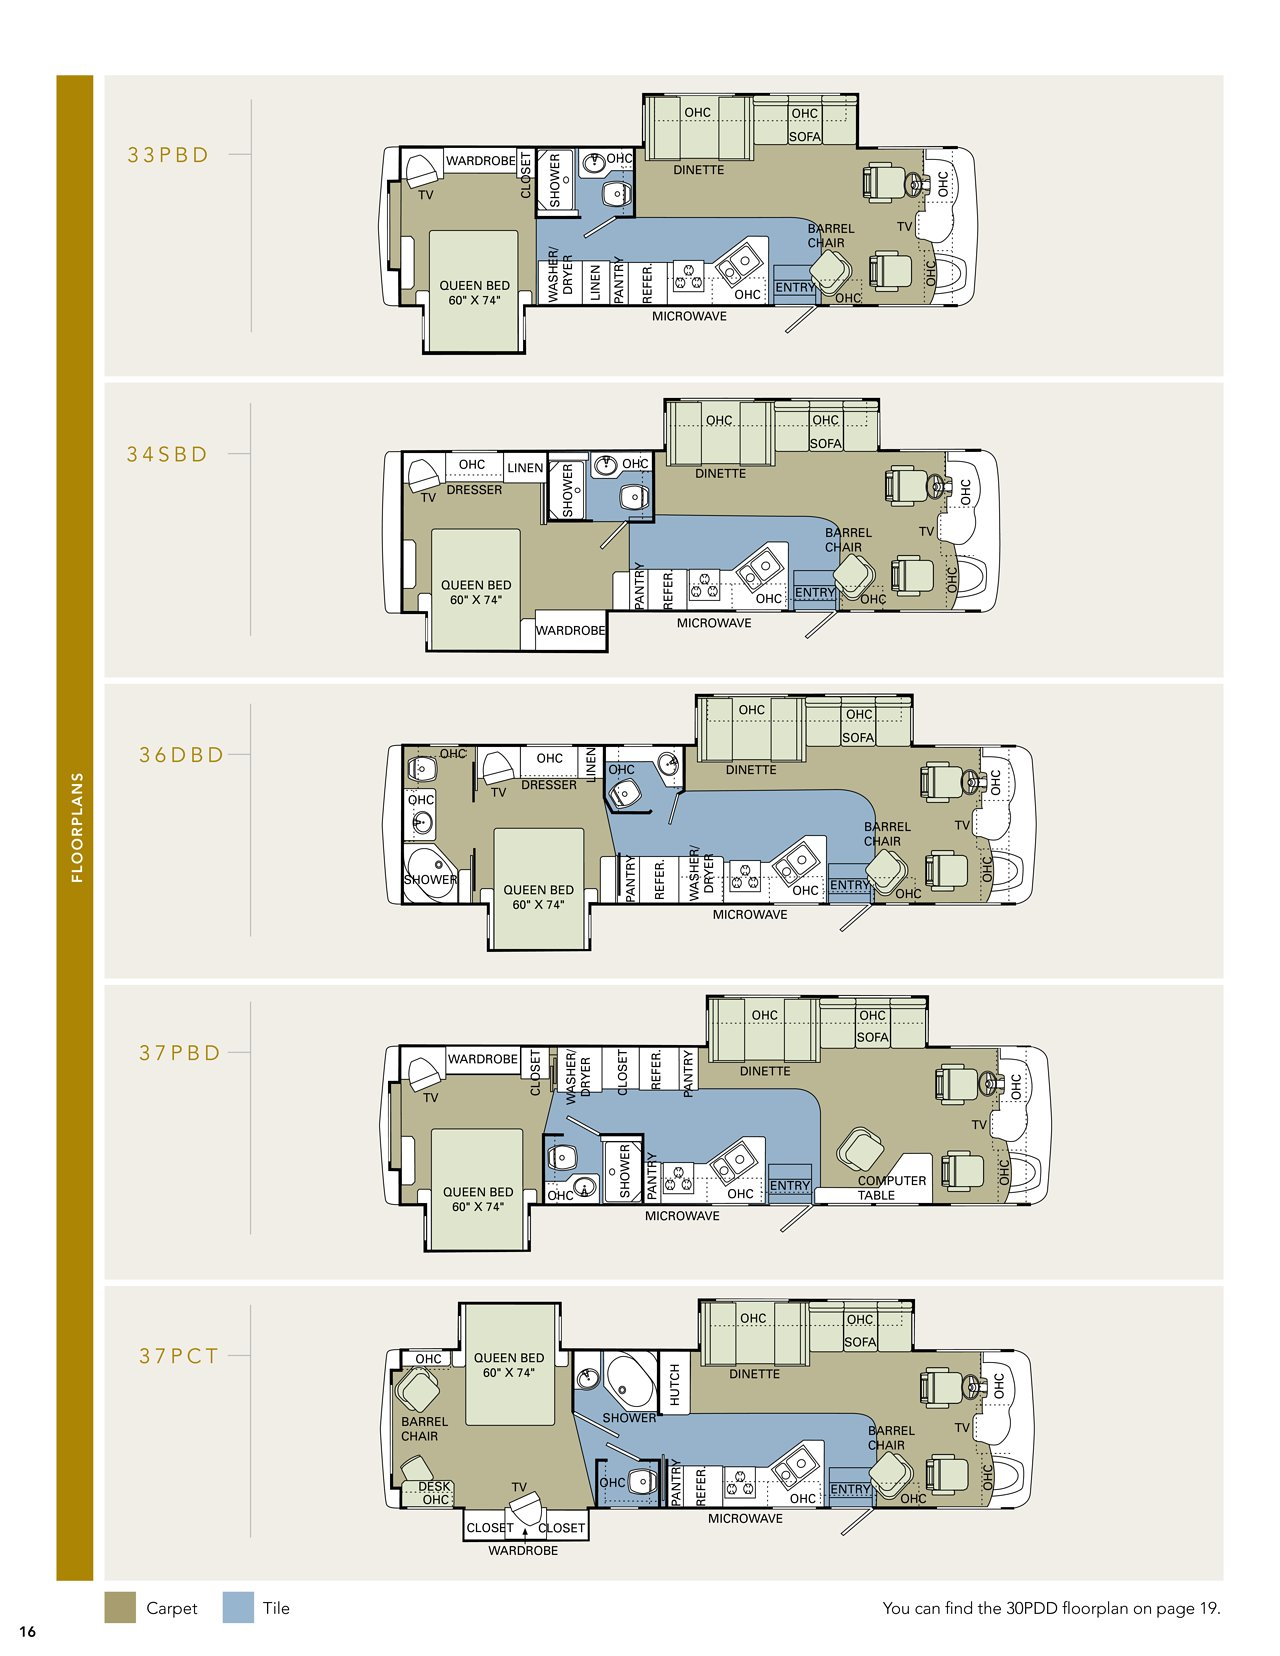 terry travel trailer wiring diagram for ac compressor holiday rambler diagrams car tachometer